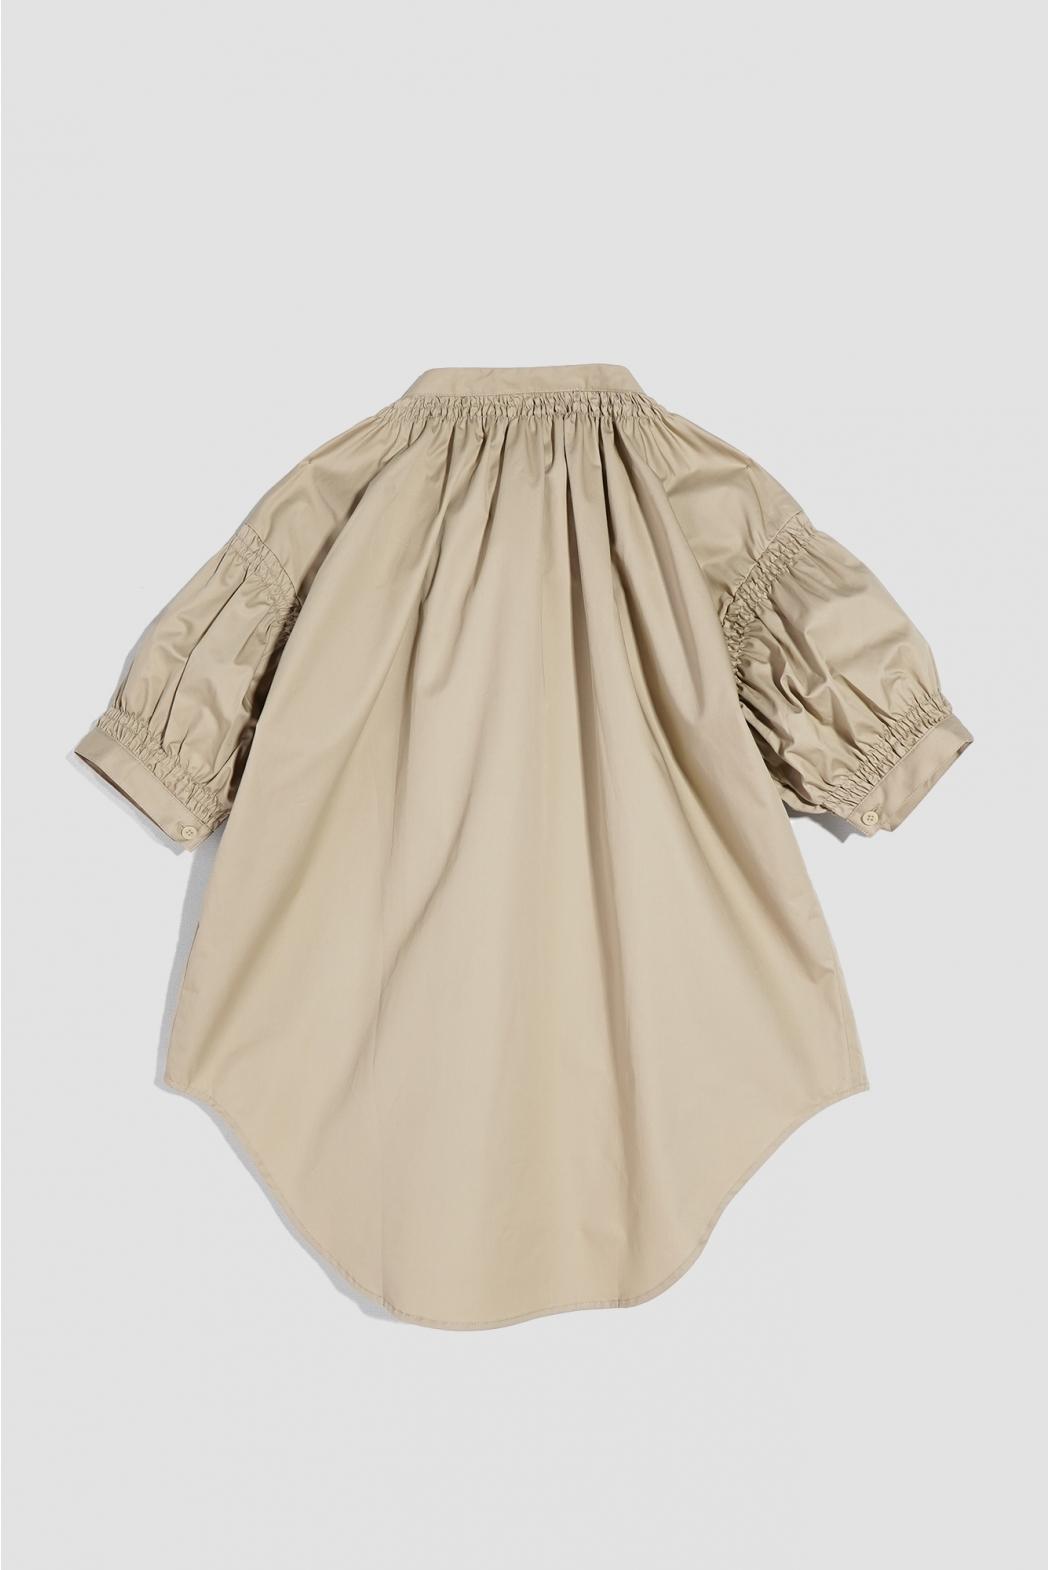 Áo sơ mi tay ngắn, có nhún. Cotton twill silk - 10F20SHSW006